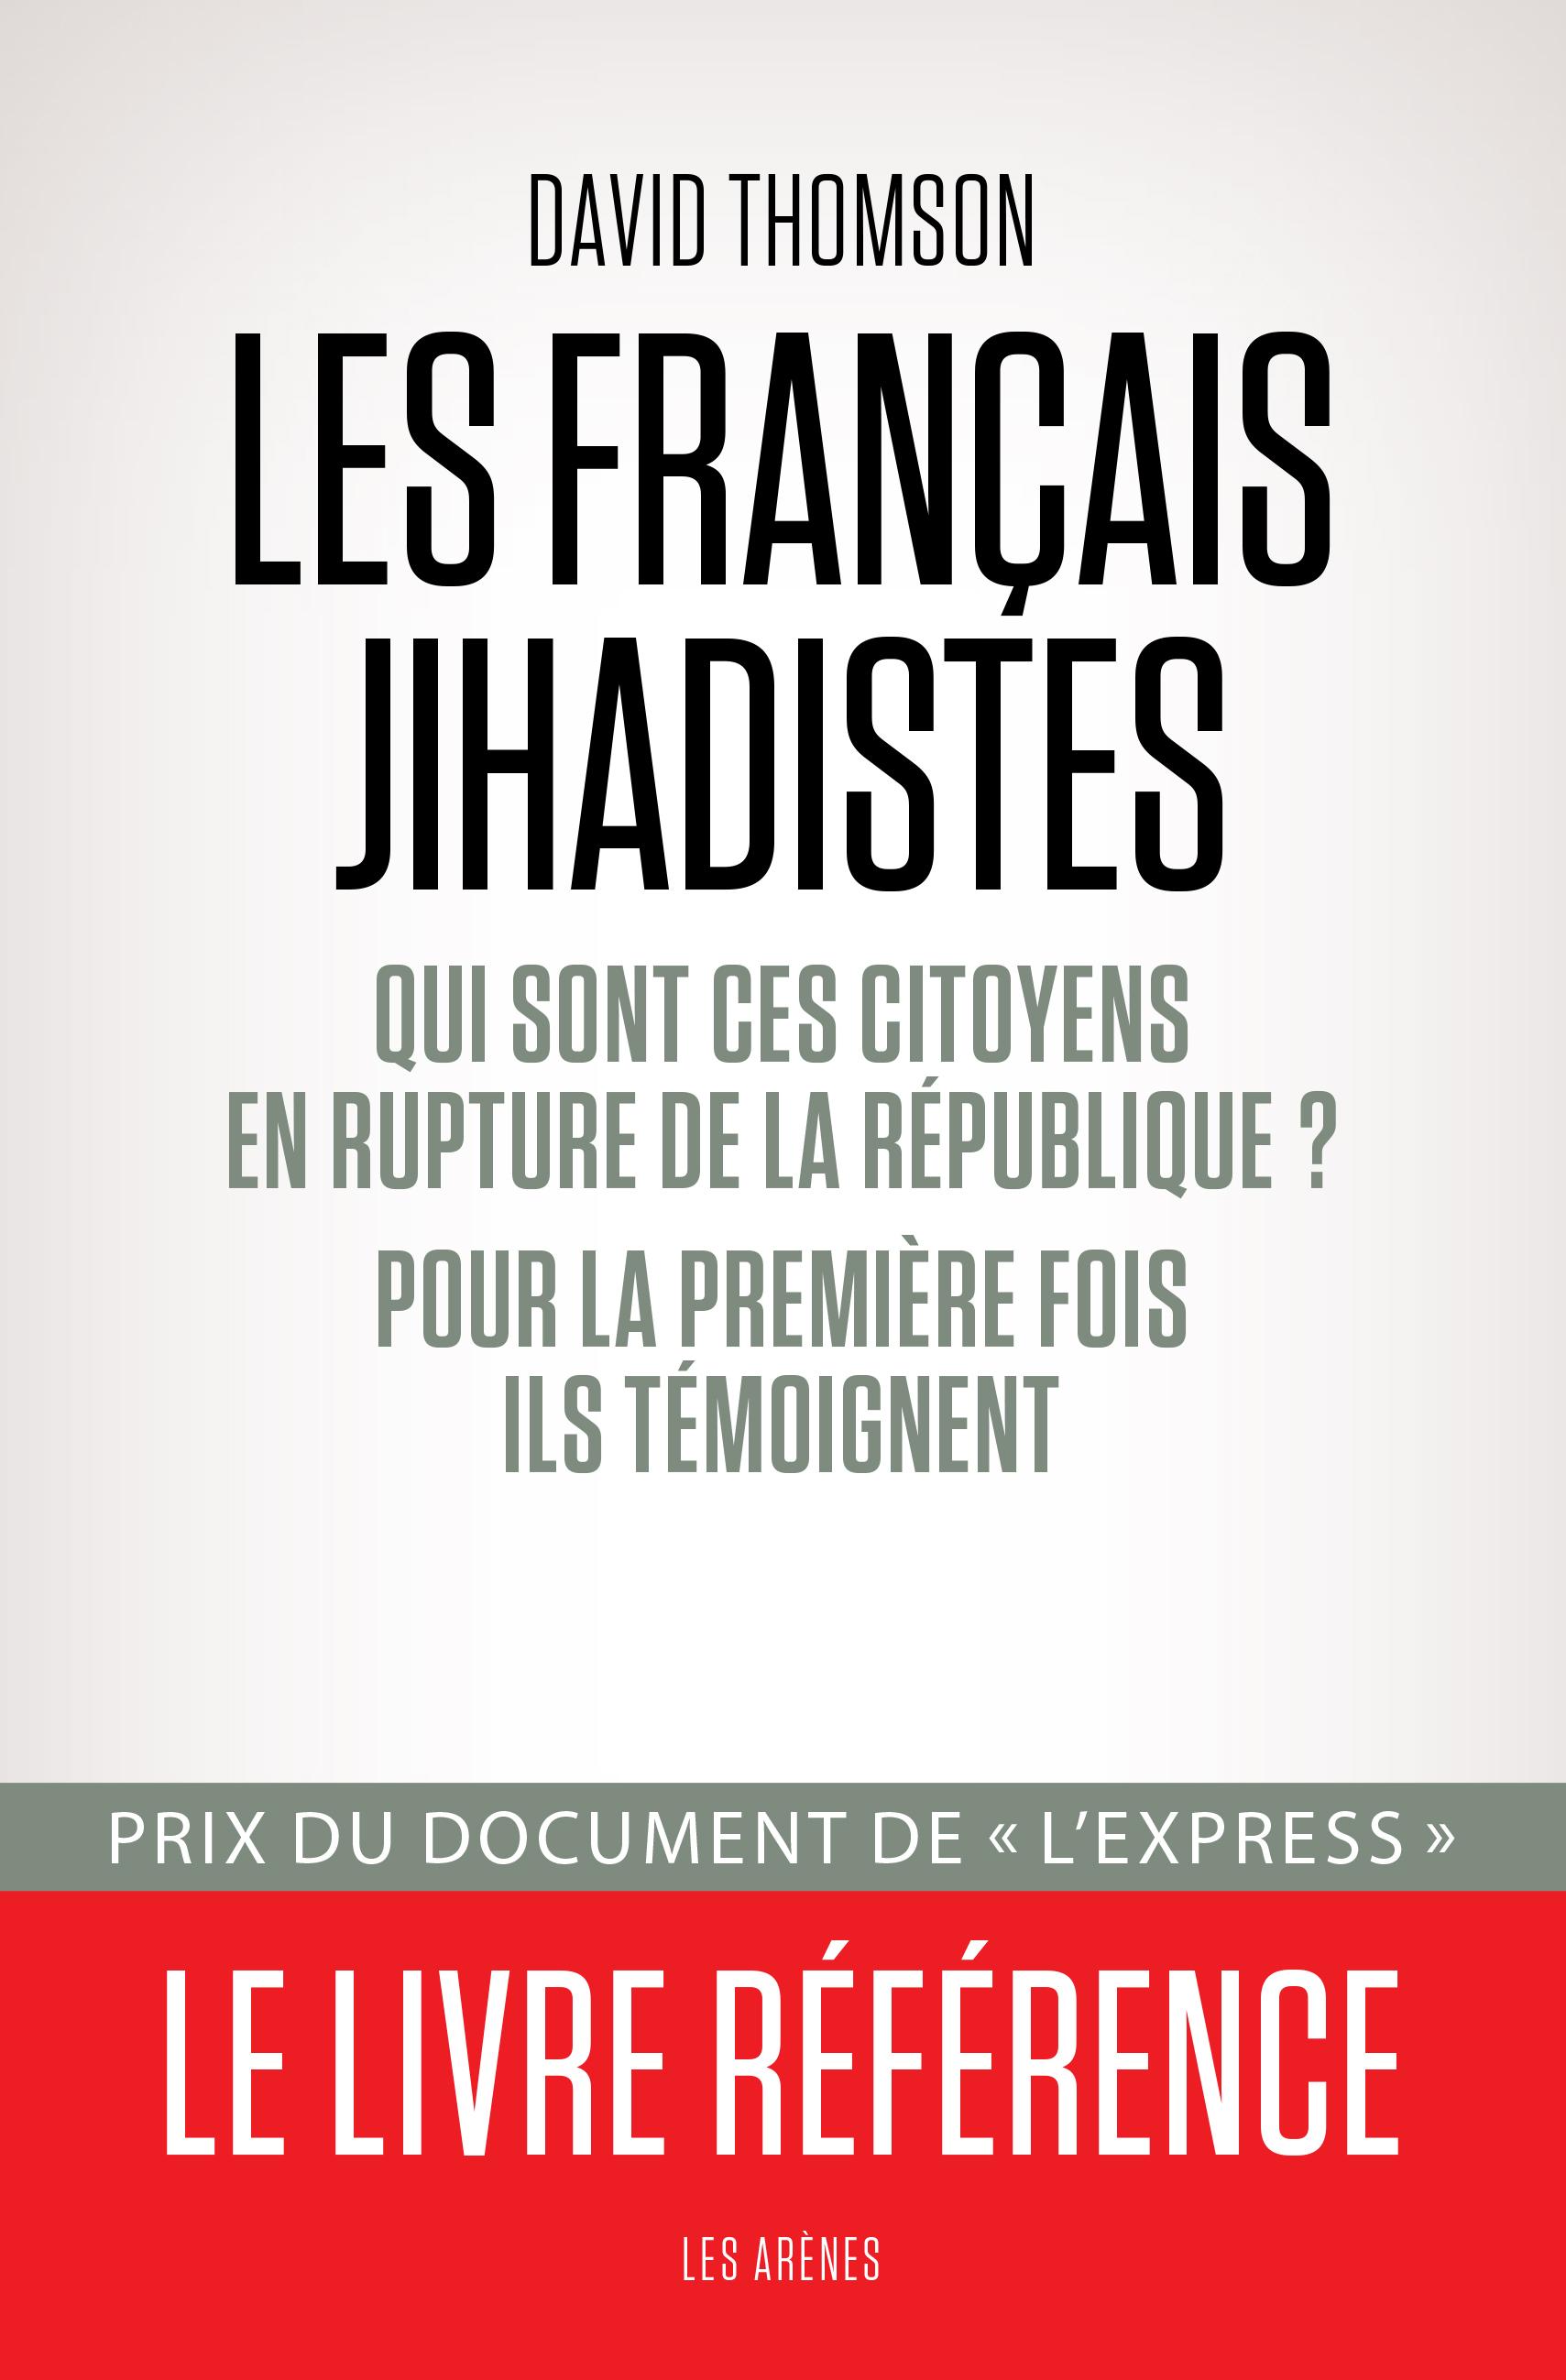 les francais djihadistes david thomson bibliolingus